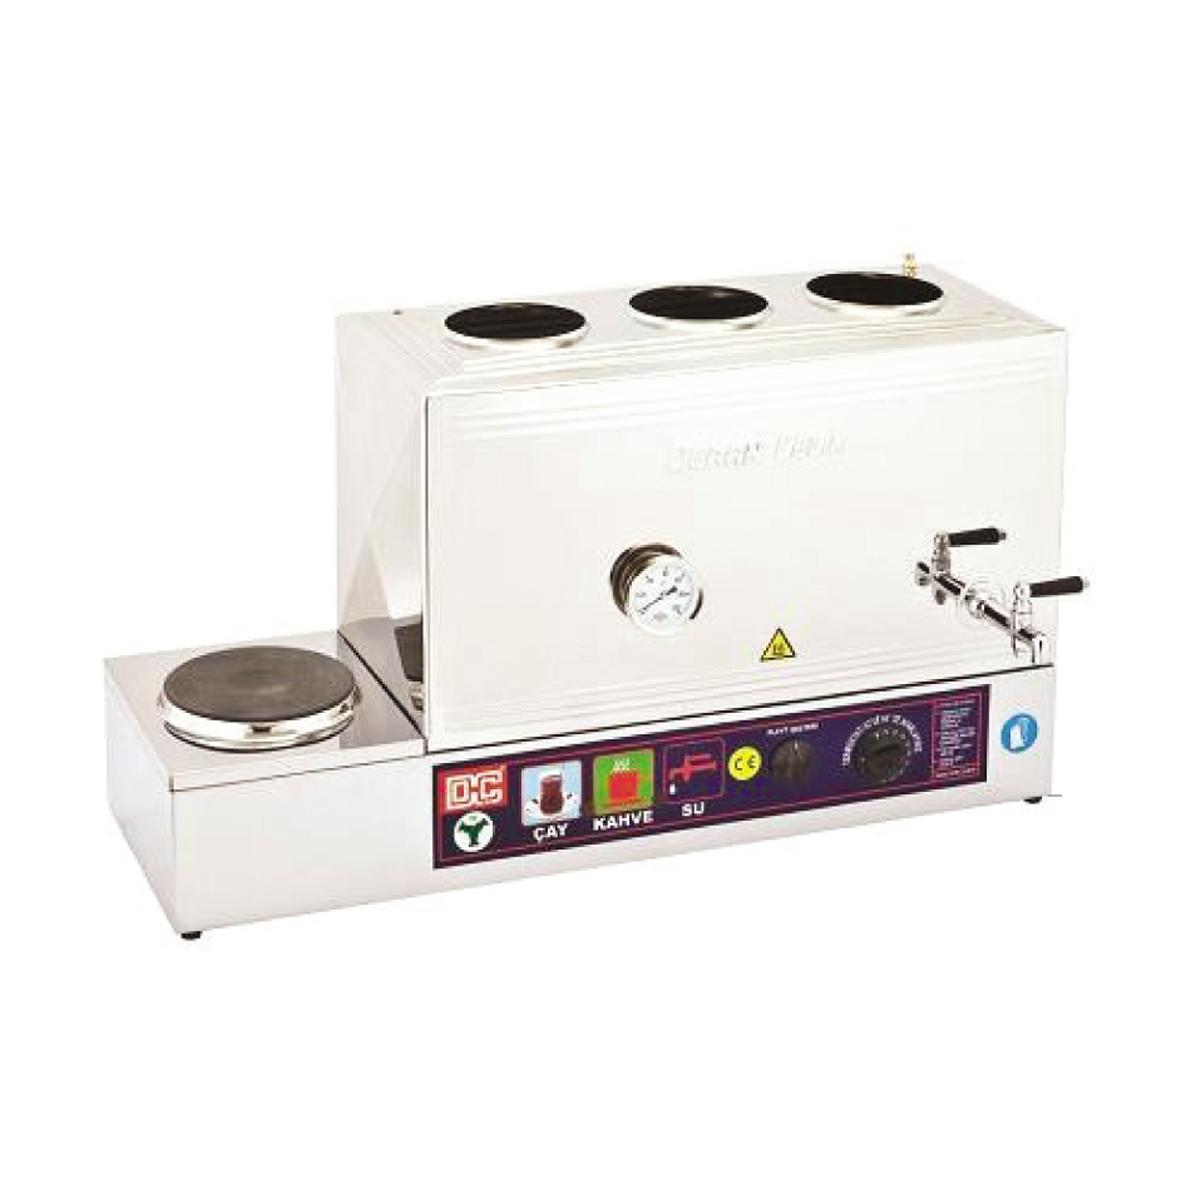 Tea Boiler Threaded 55 - Electric